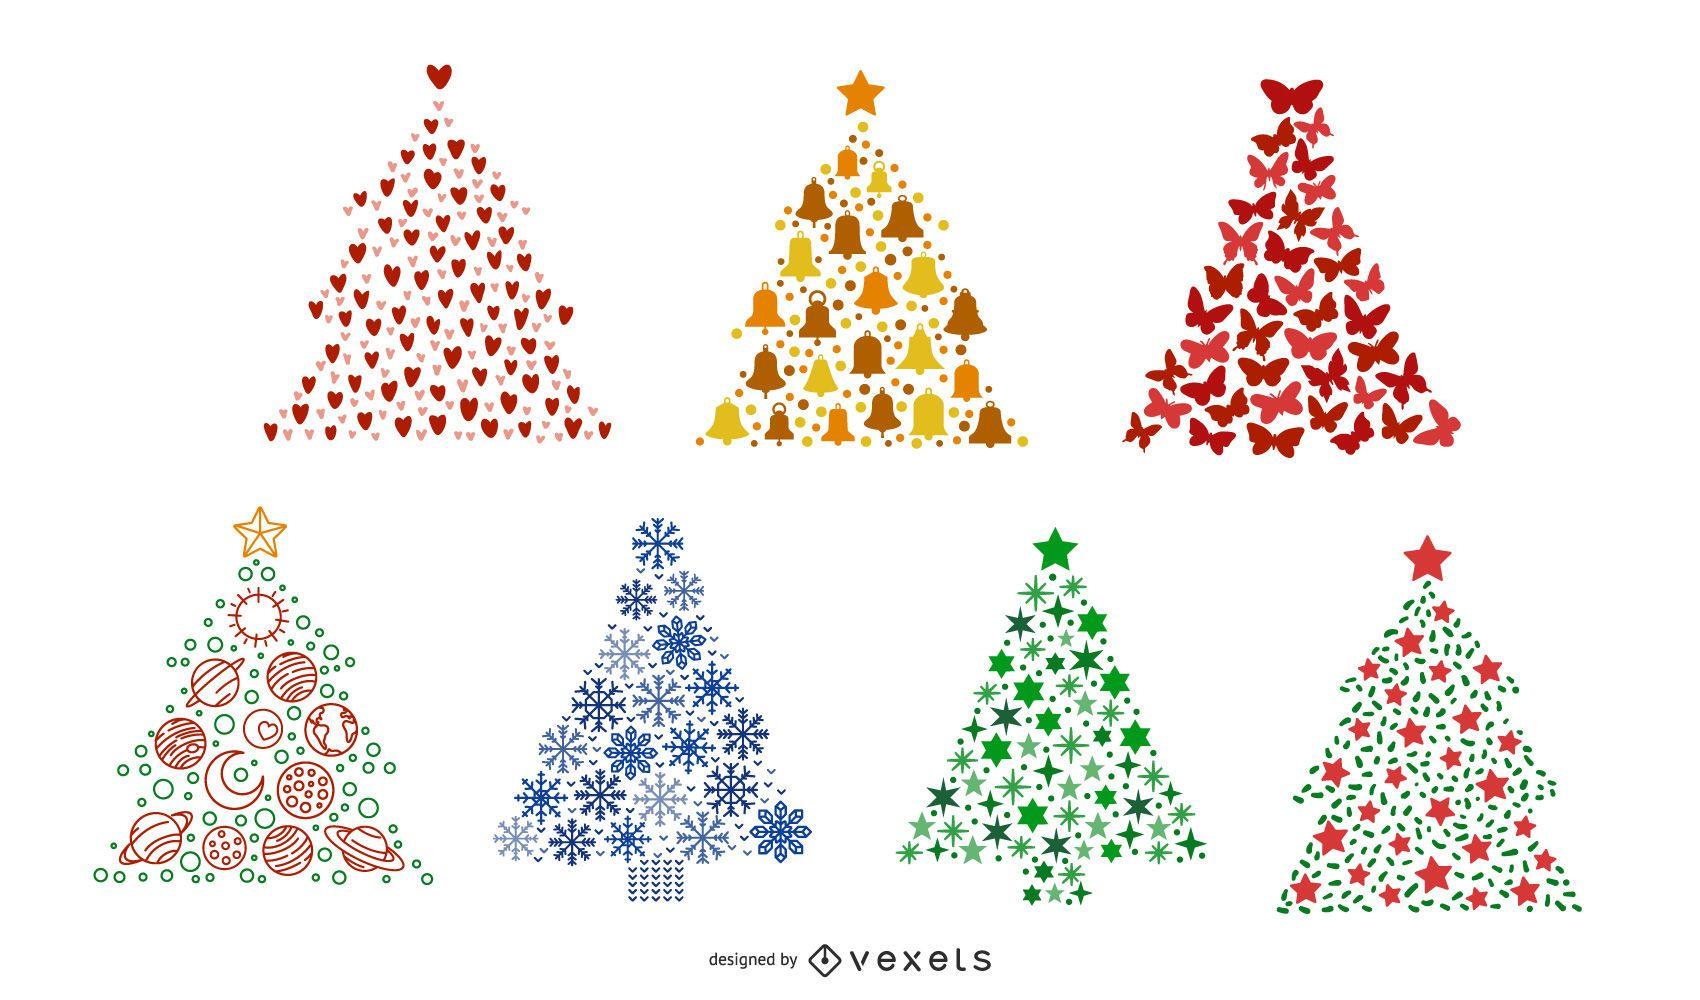 Bunte Weihnachtsbäume gesetzt